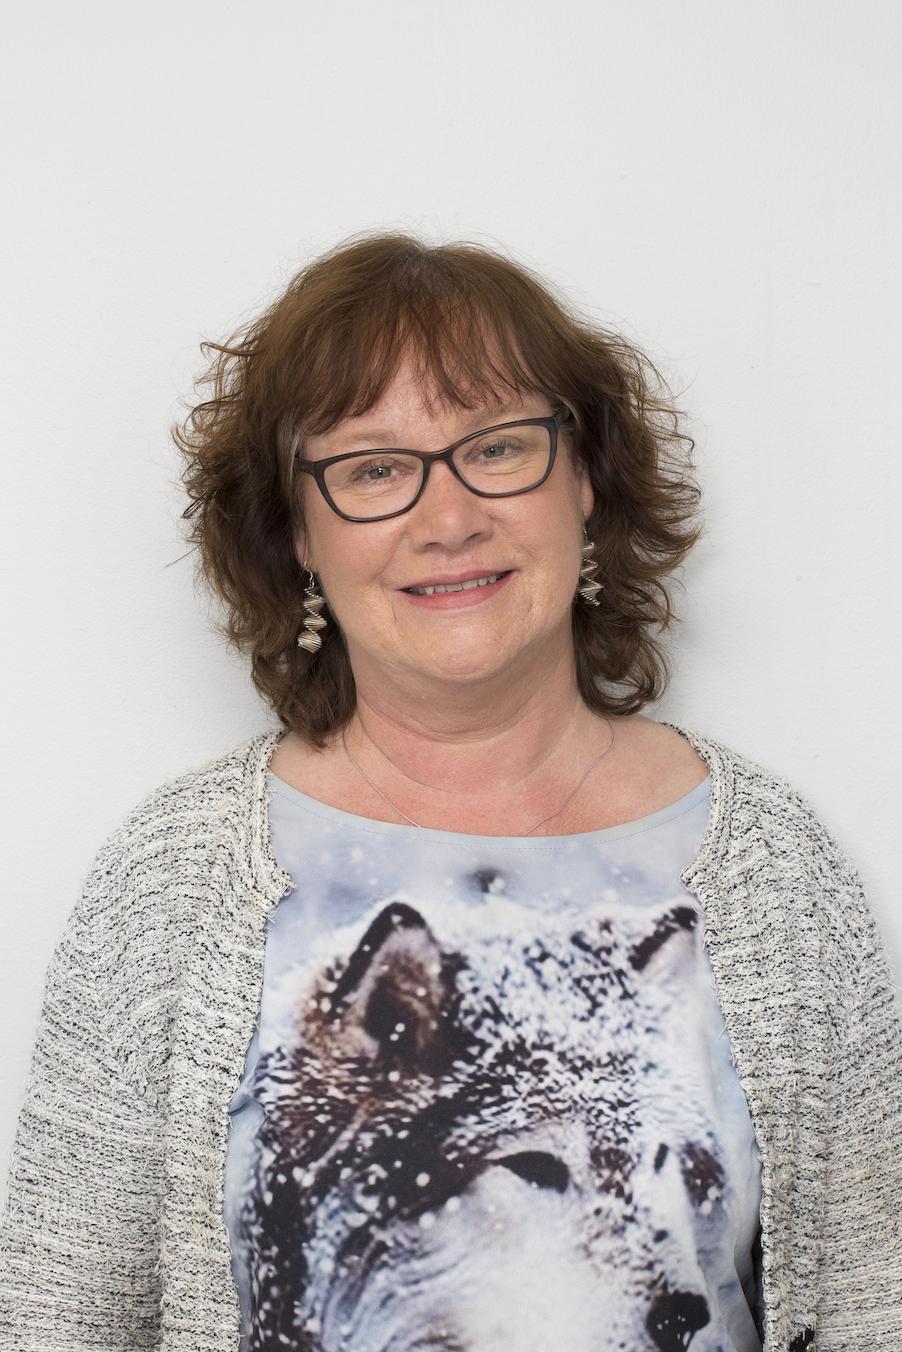 Helen Larsen